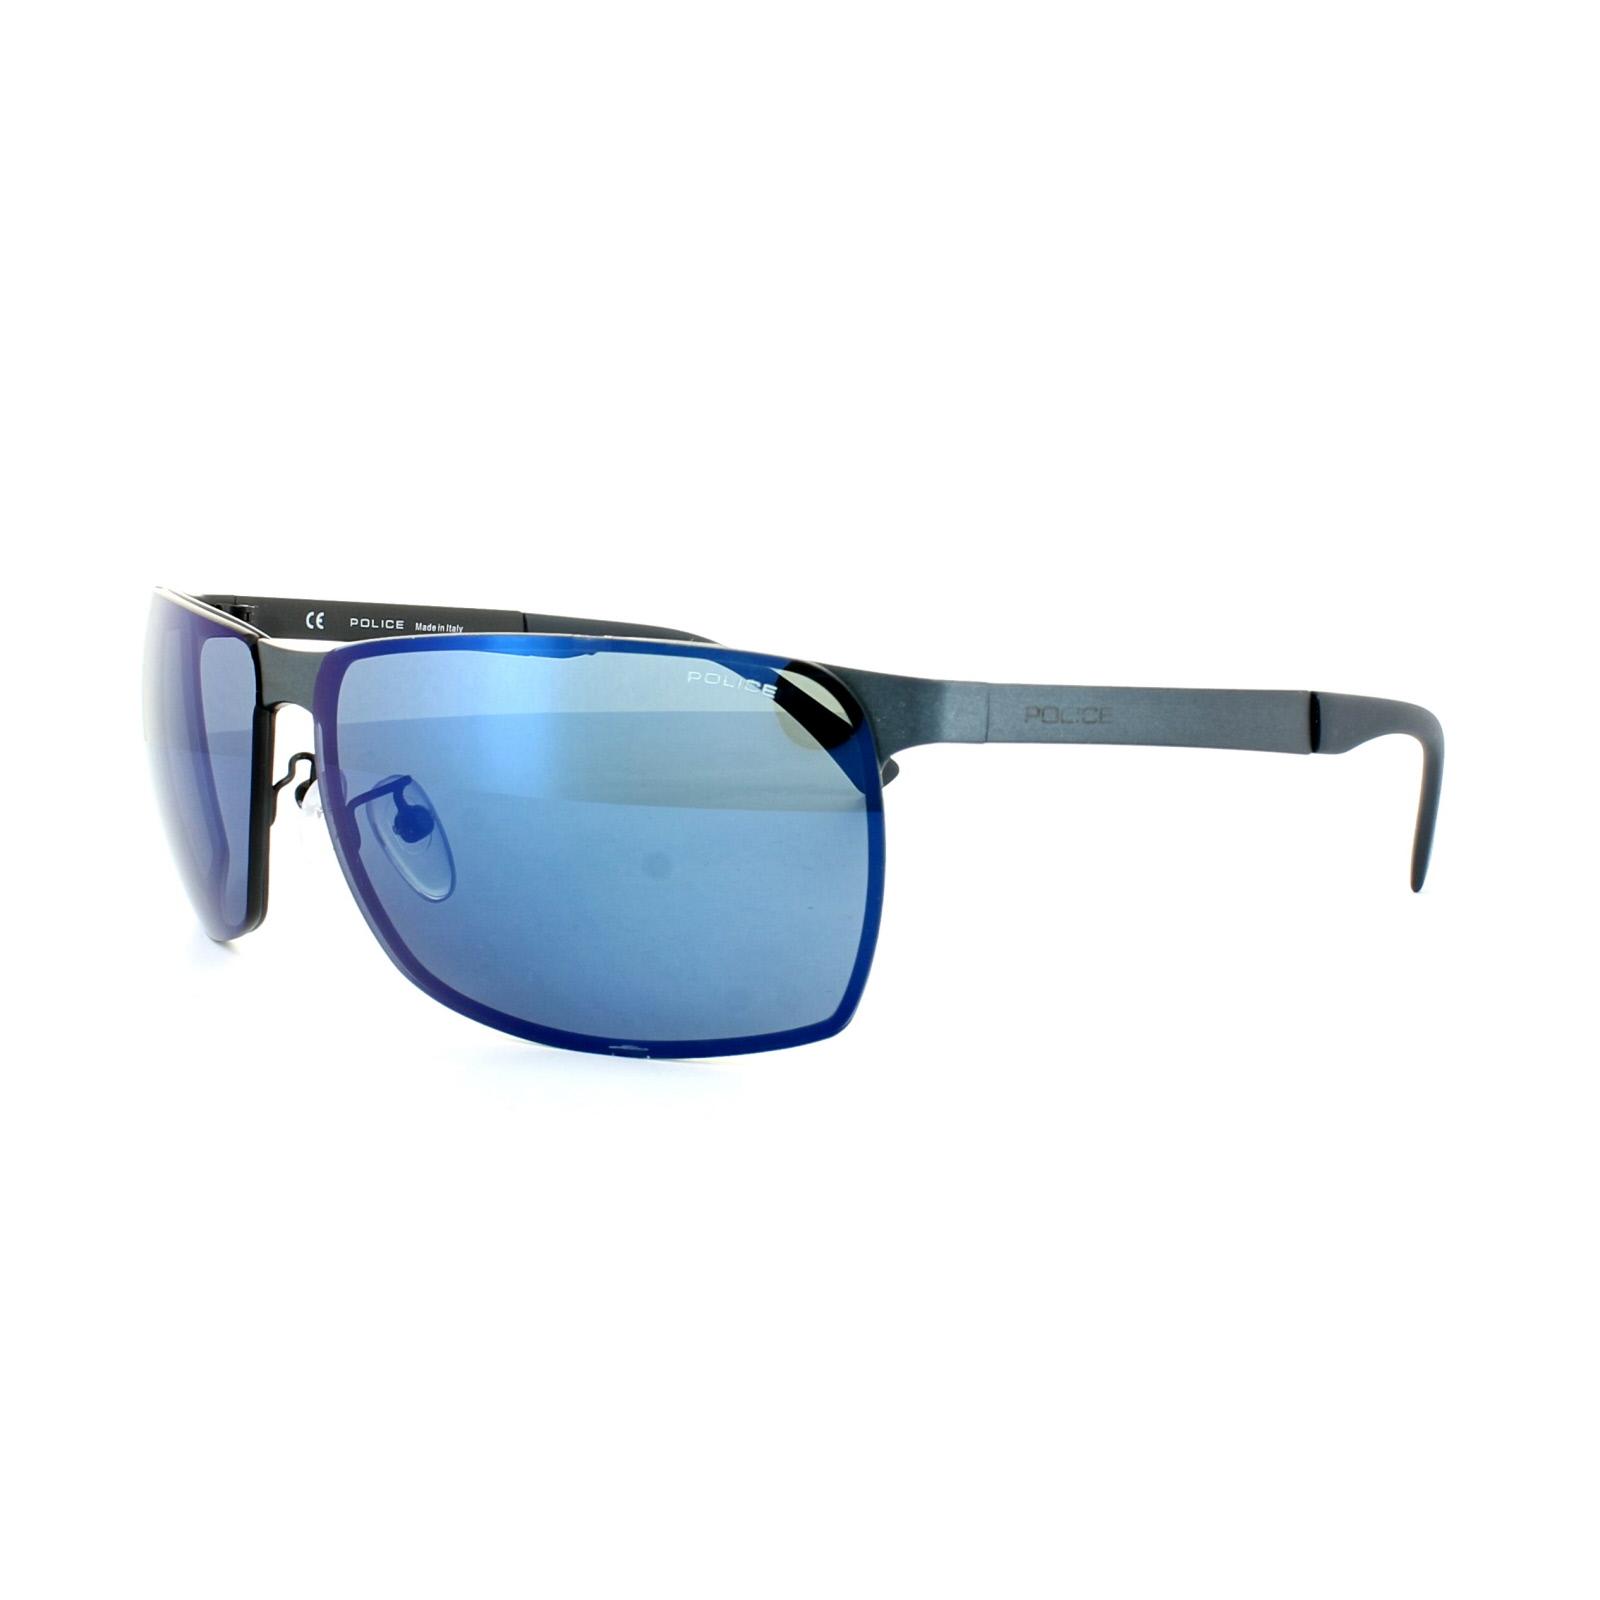 2916fe1ba6f Cube Sunglasses Price - Bitterroot Public Library